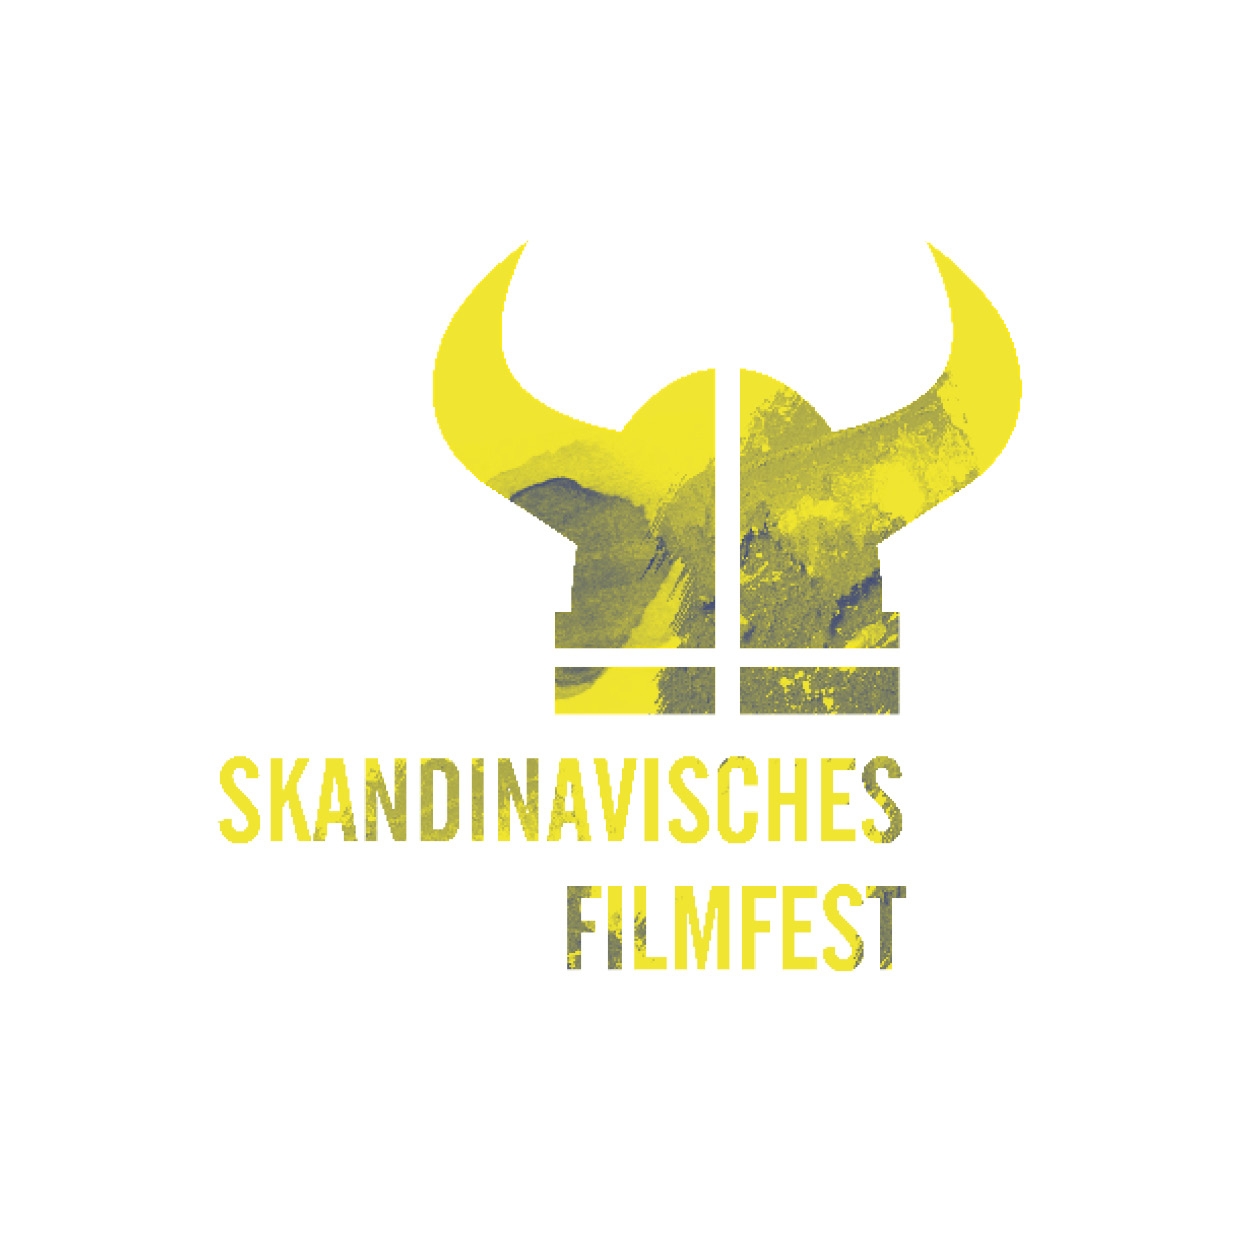 skandinavisches Filmest